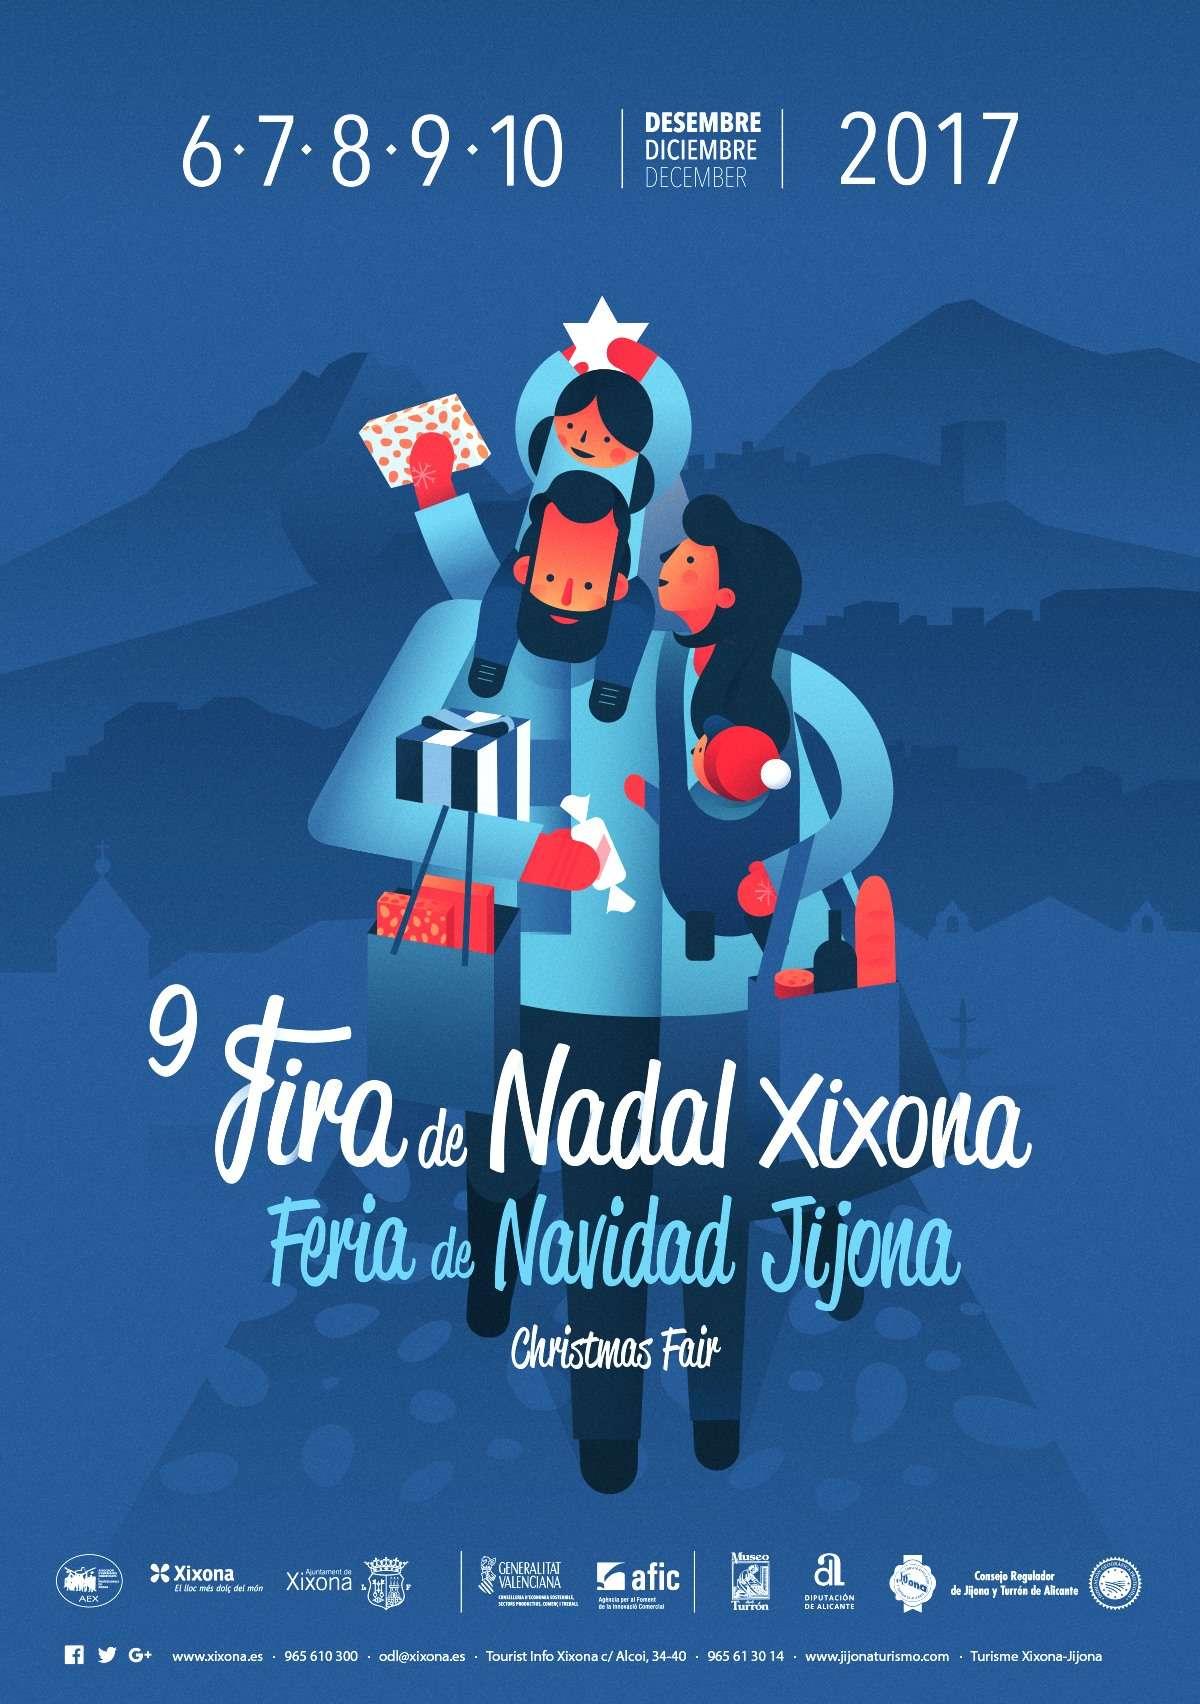 feria-navidad-jijona-2017